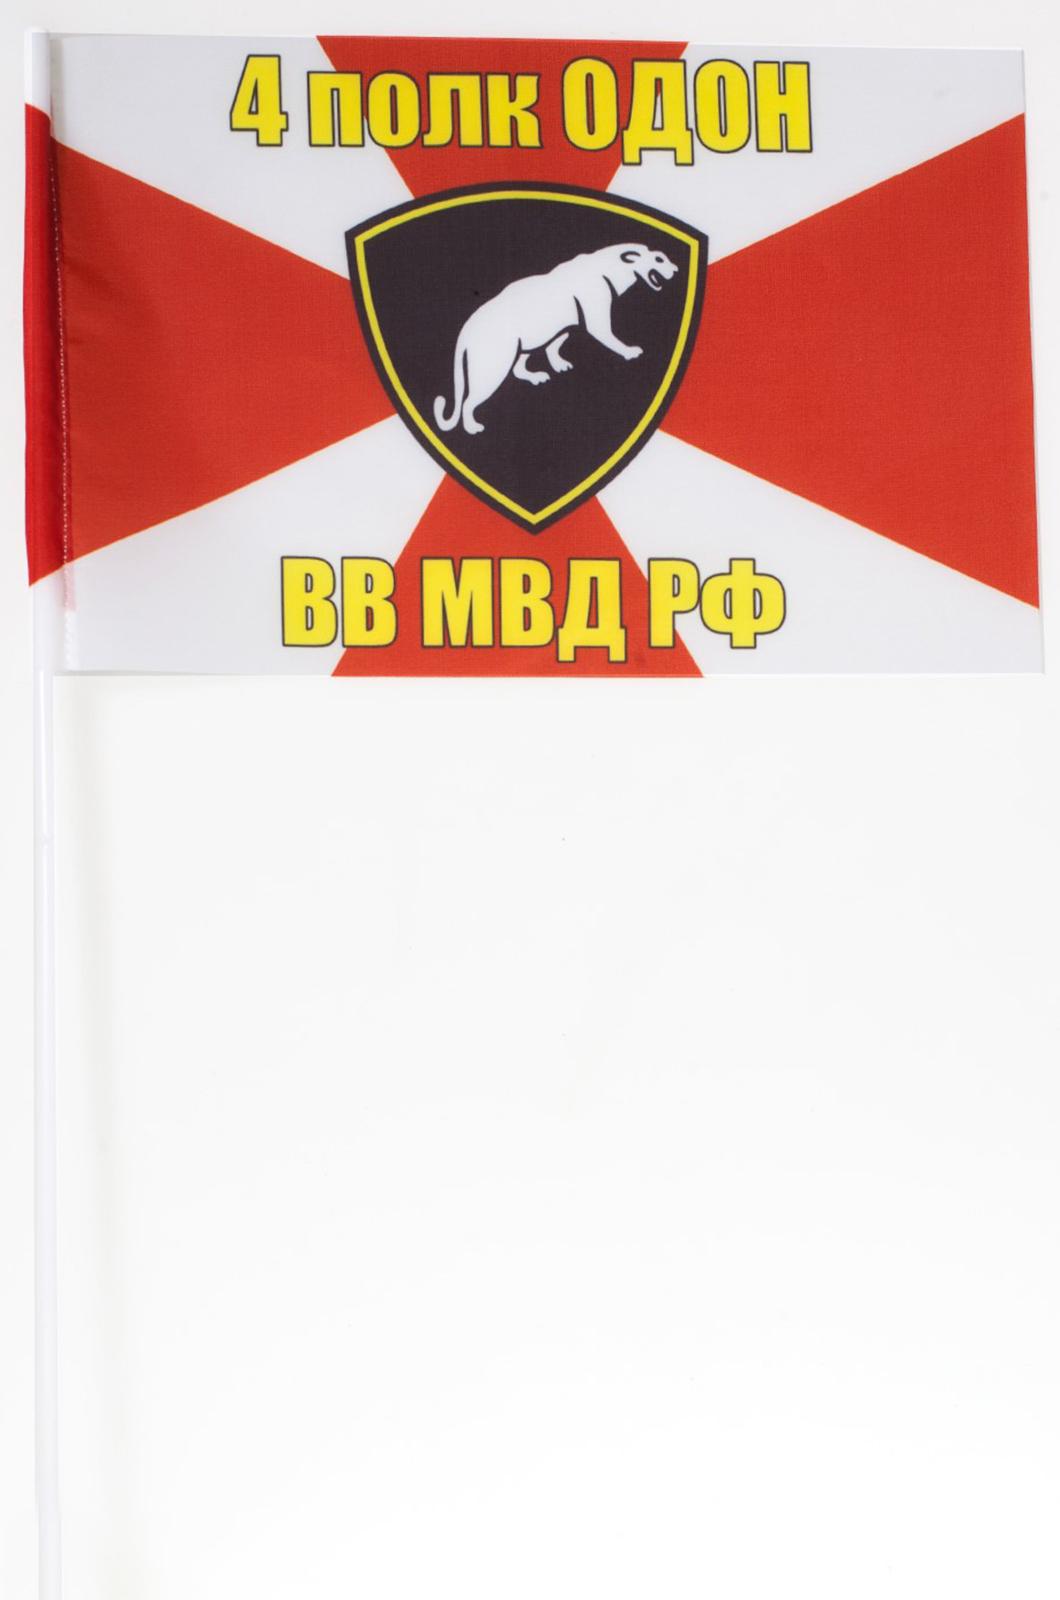 Флаг 4 полка ОДОН ВВ МВД РФ